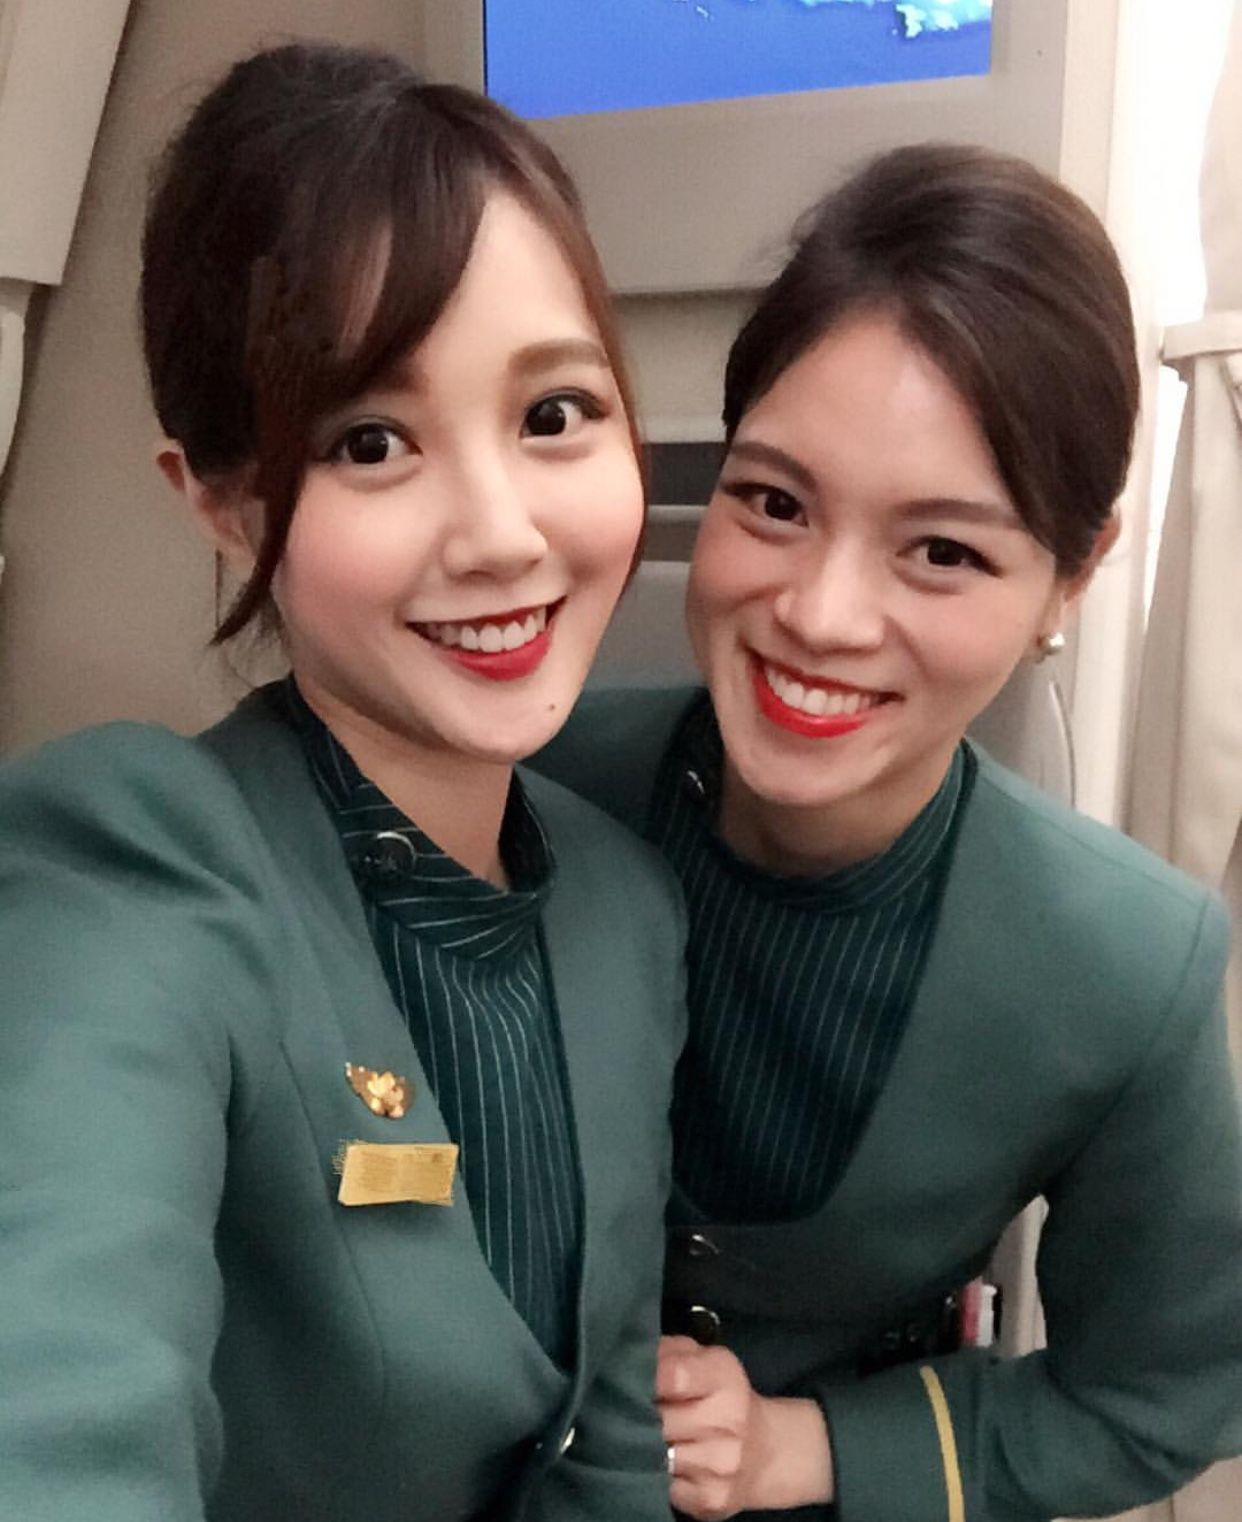 【Taiwan】 EVA Air cabin crew (old uniform) / エバー航空 客室乗務員 旧